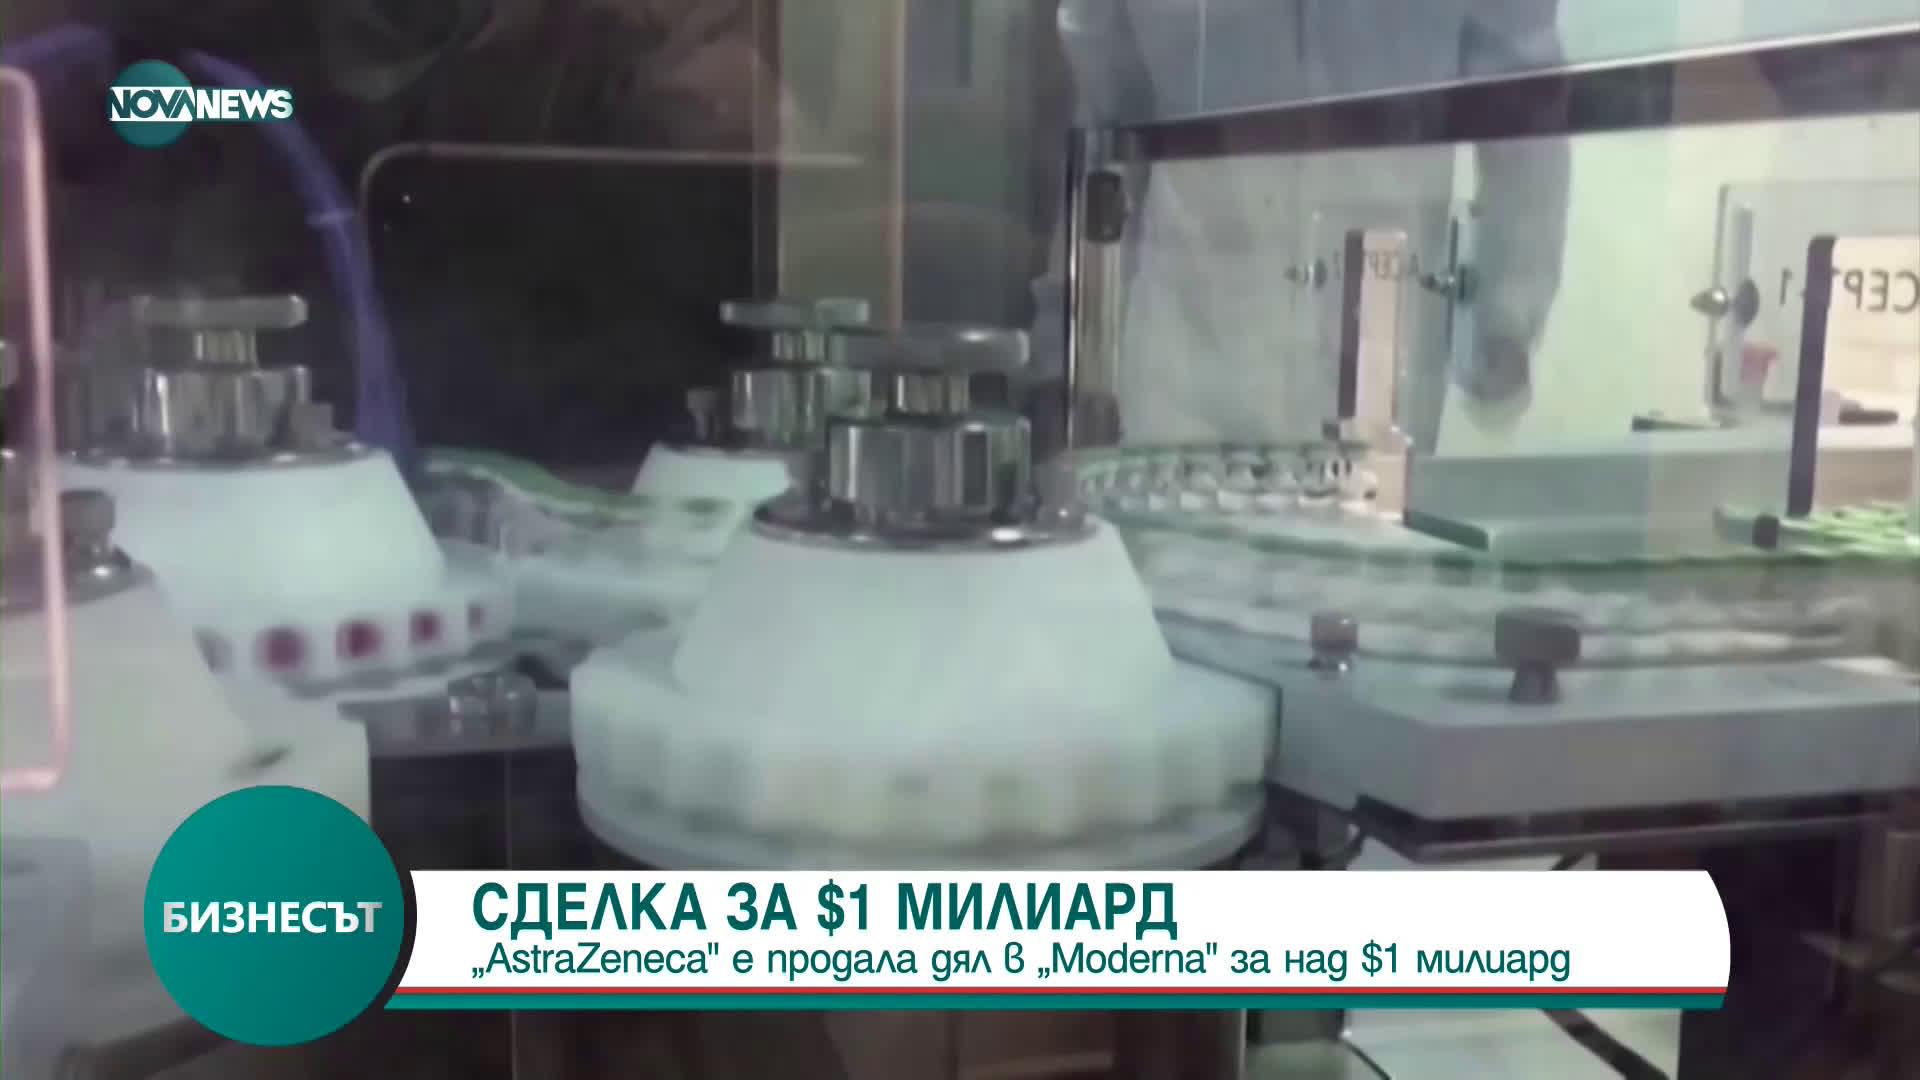 СДЕЛКА ЗА $1 МИЛИАРД: AstraZeneca е продала дял в Moderna